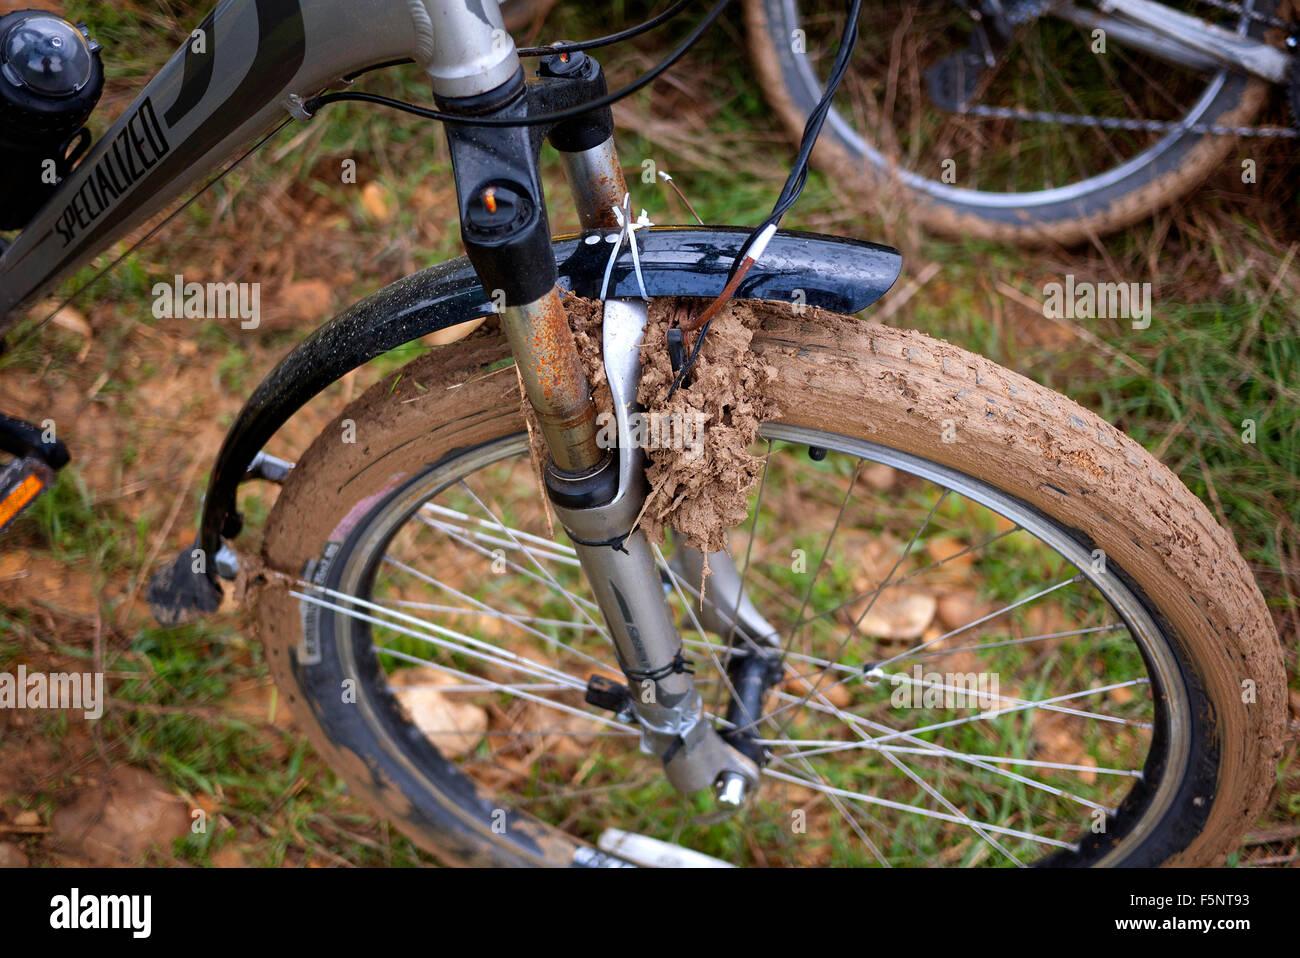 Mud clogged bicycle wheel. - Stock Image